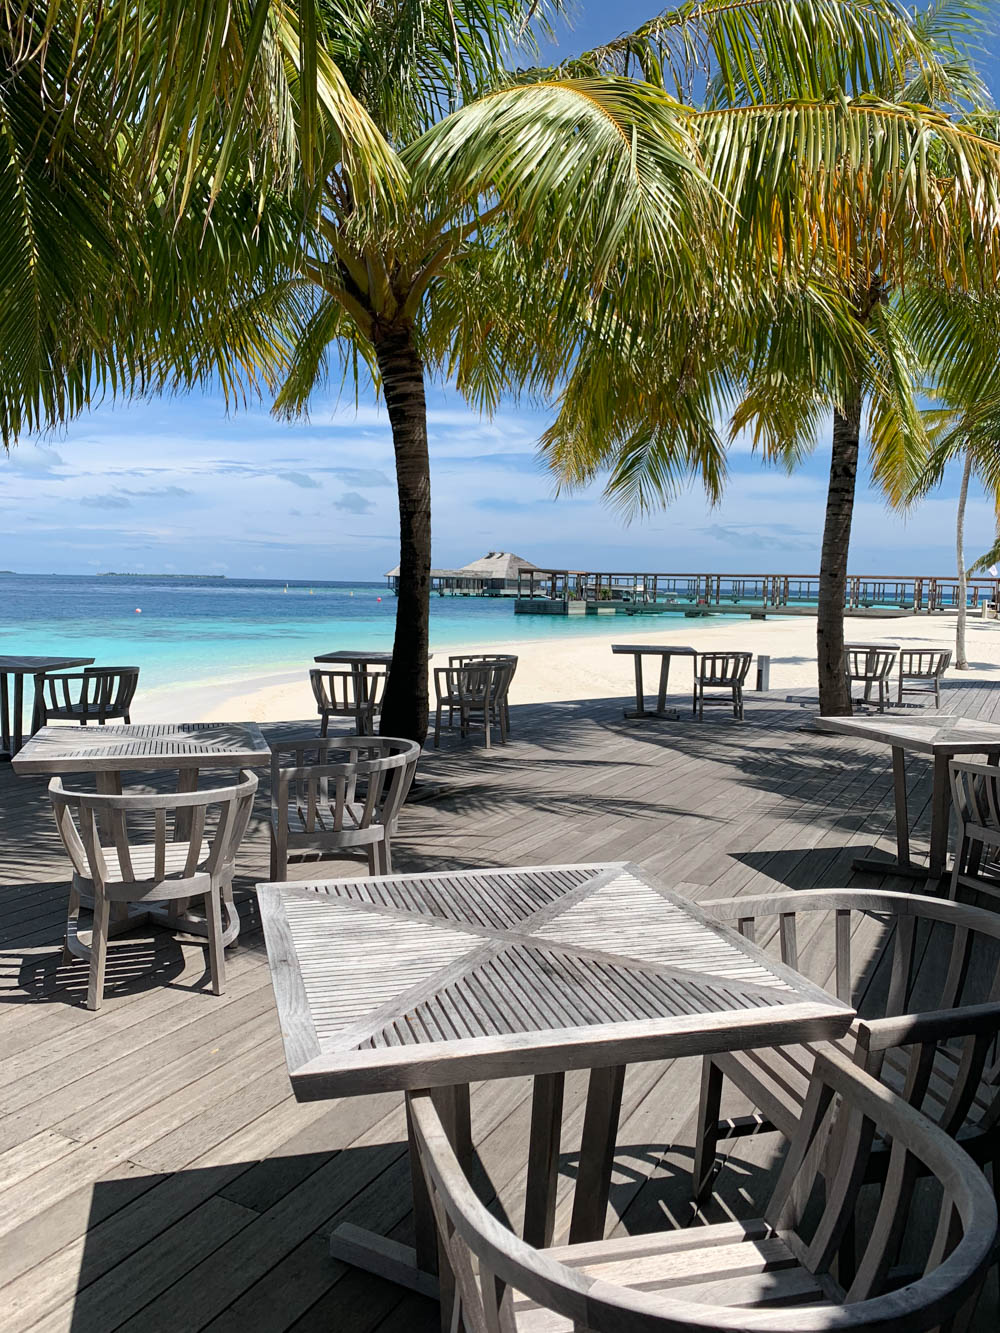 Maldives_Resort_Honeymoon_Hurawalhi_MaldivesTravelAdvisor-19.jpg